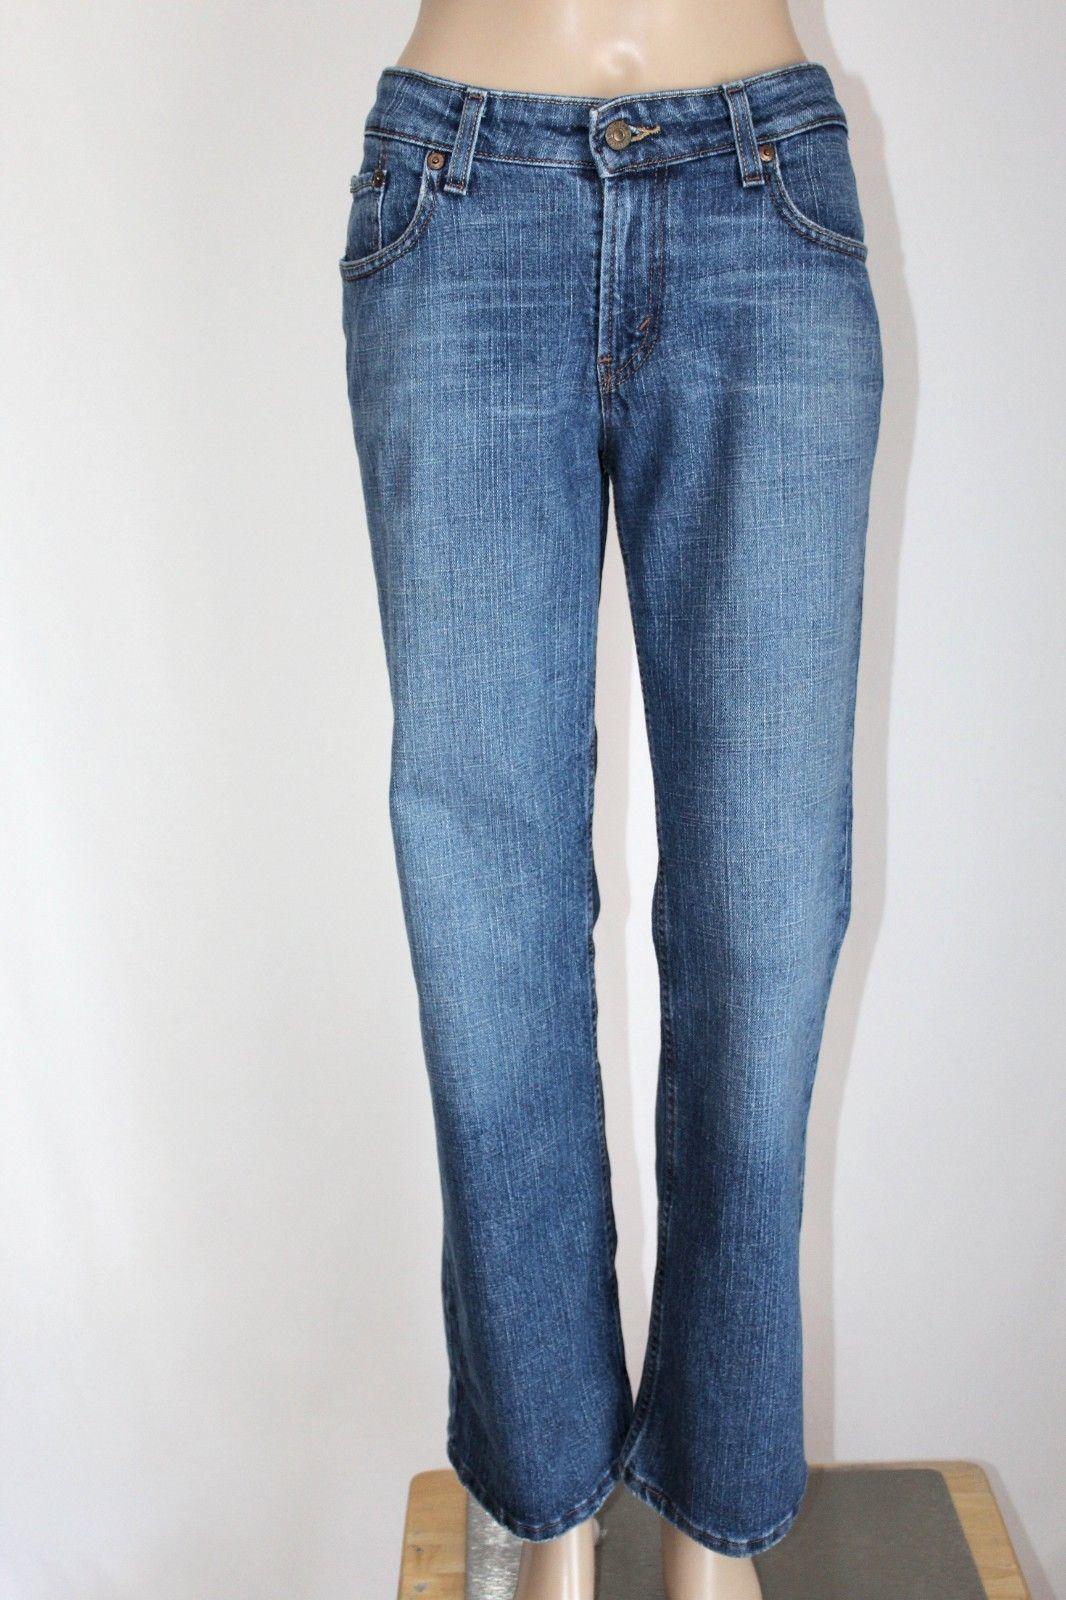 64f06278f43 LEVI'S 518 Junior Women's Size 11 Short SuperLow Boot Cut Stretch Jeans